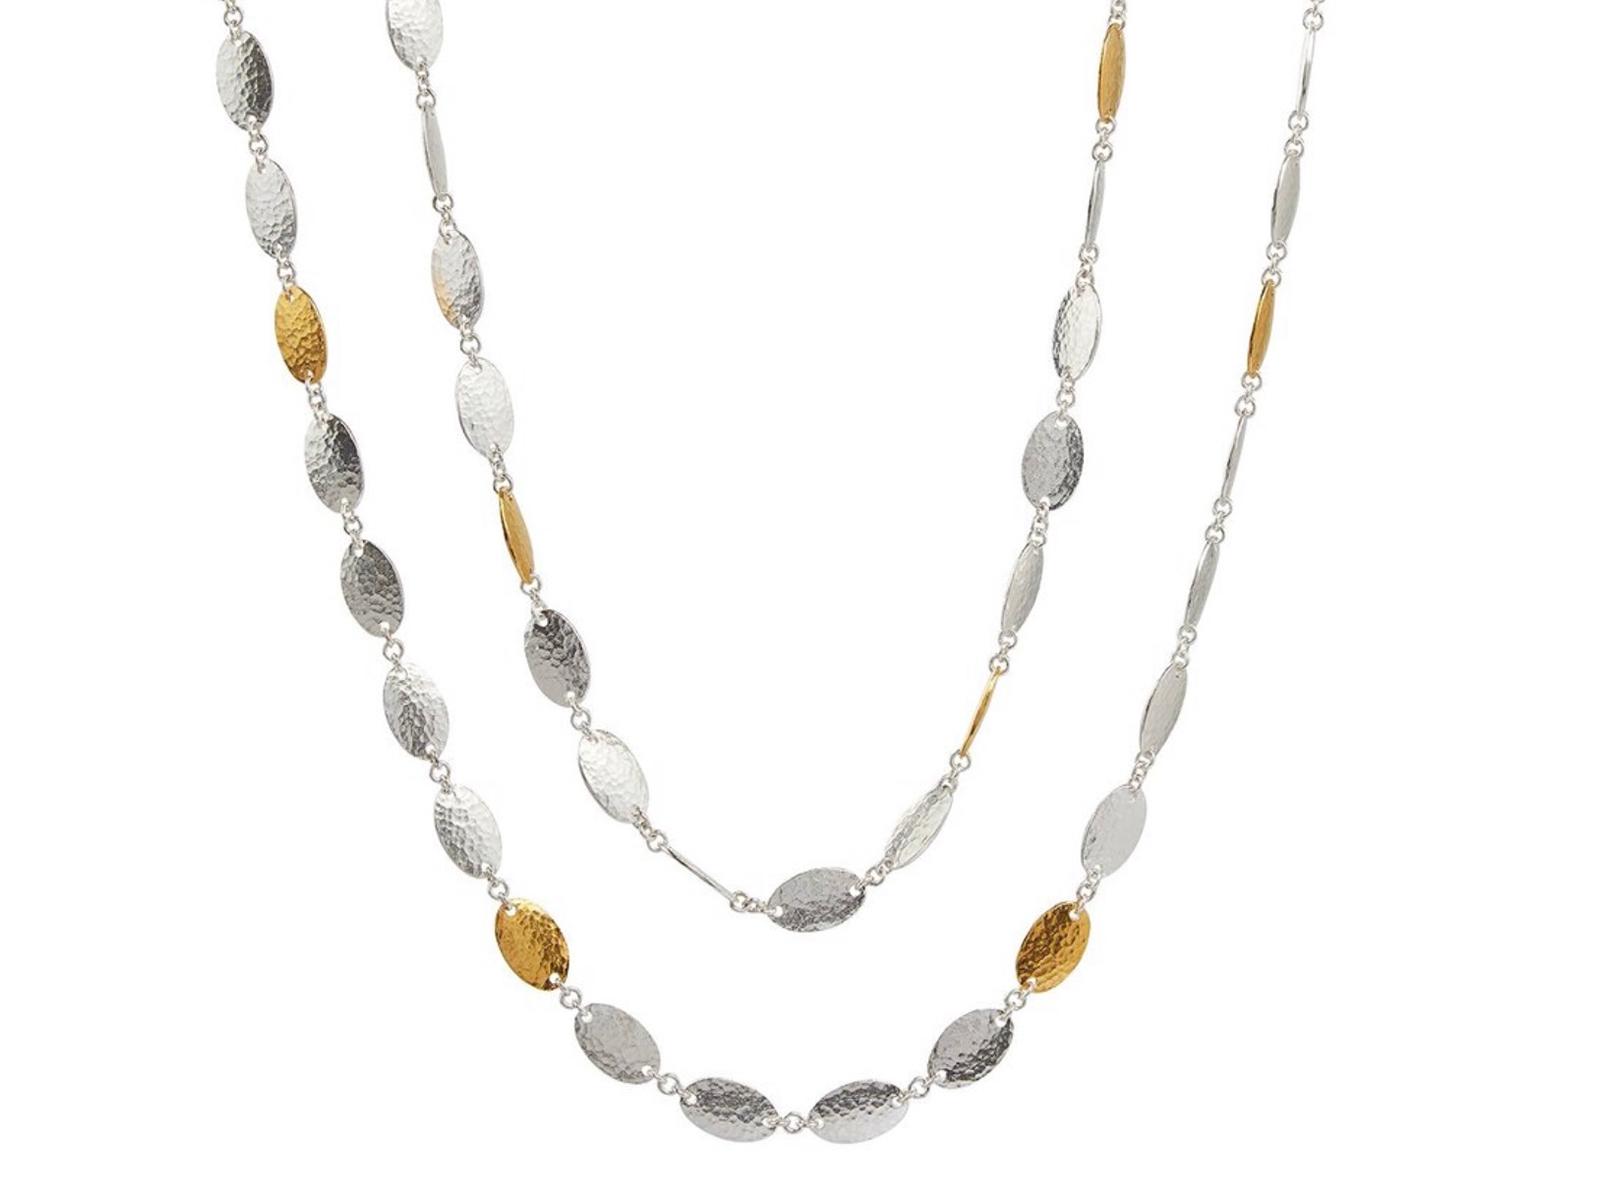 "Mango Silver Necklace 36"" Strand"